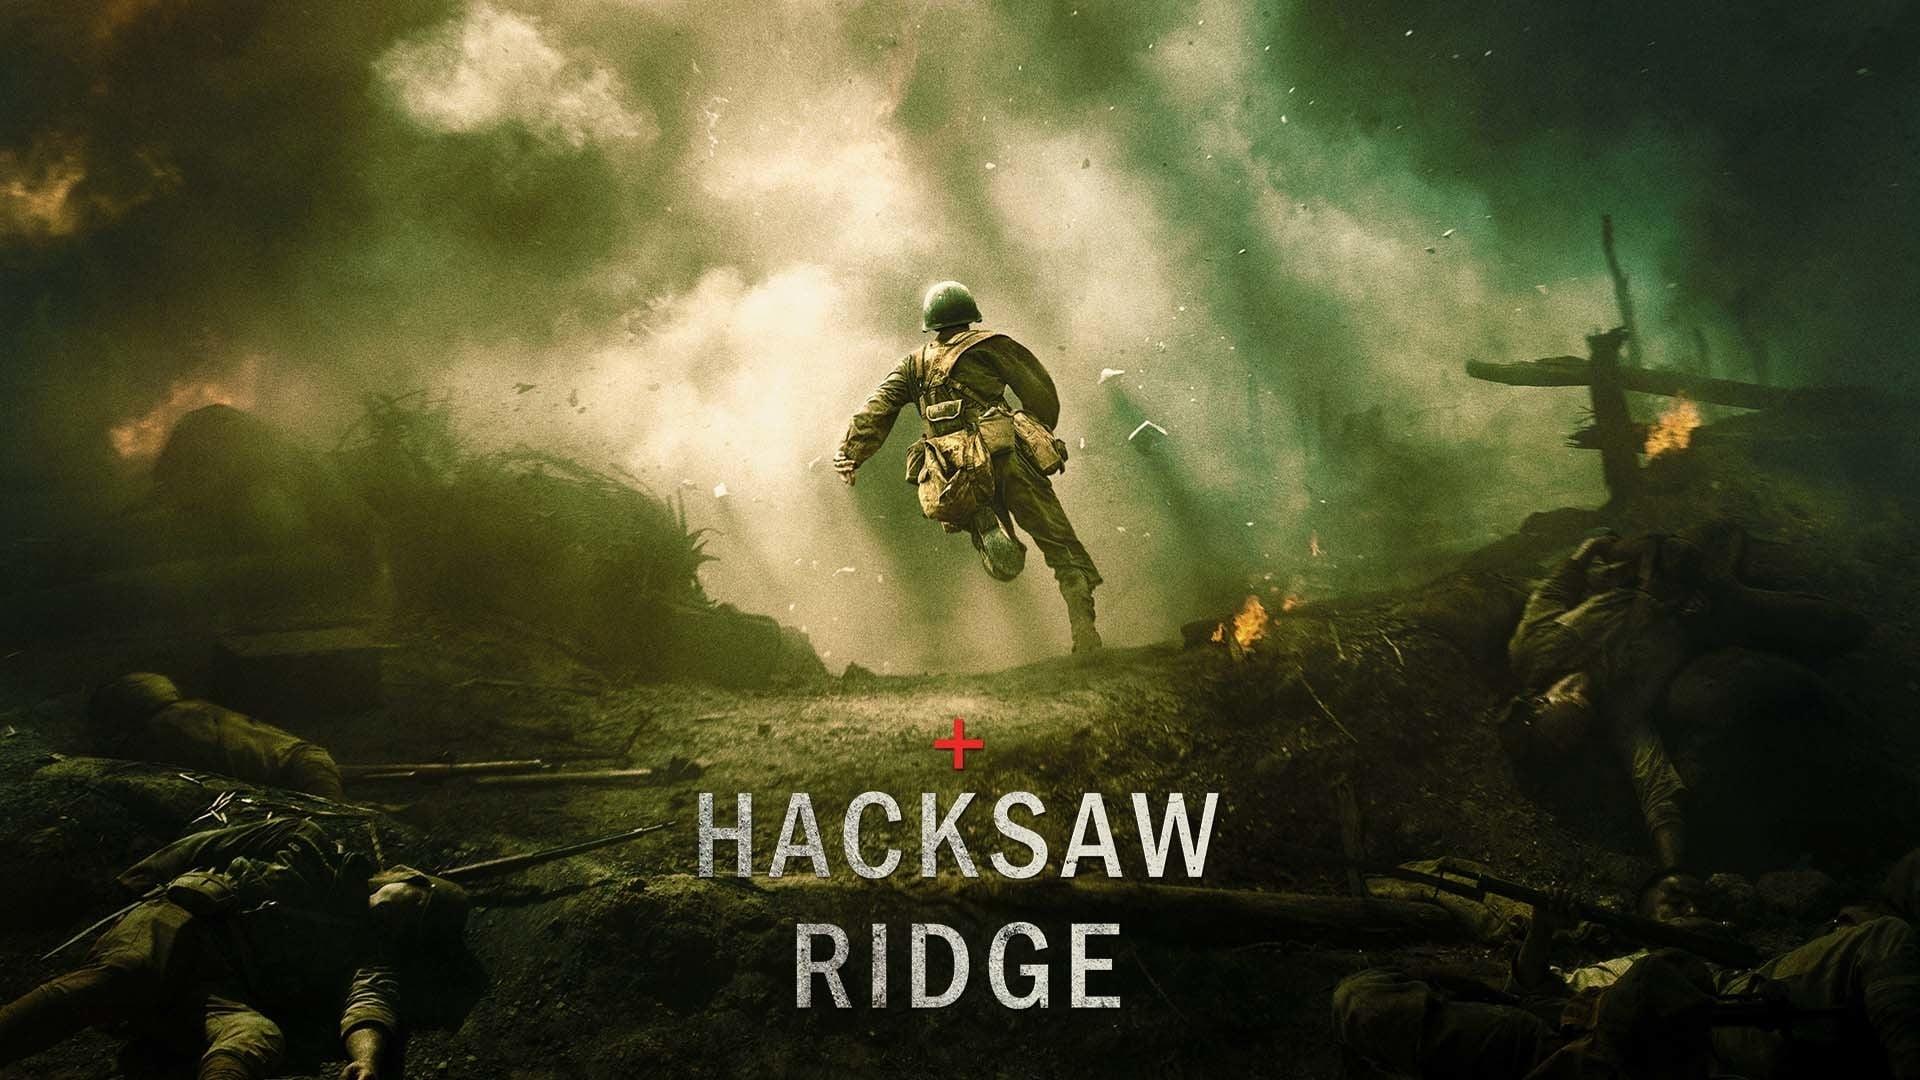 Watch Hacksaw Ridge 2016 Movies Trailer